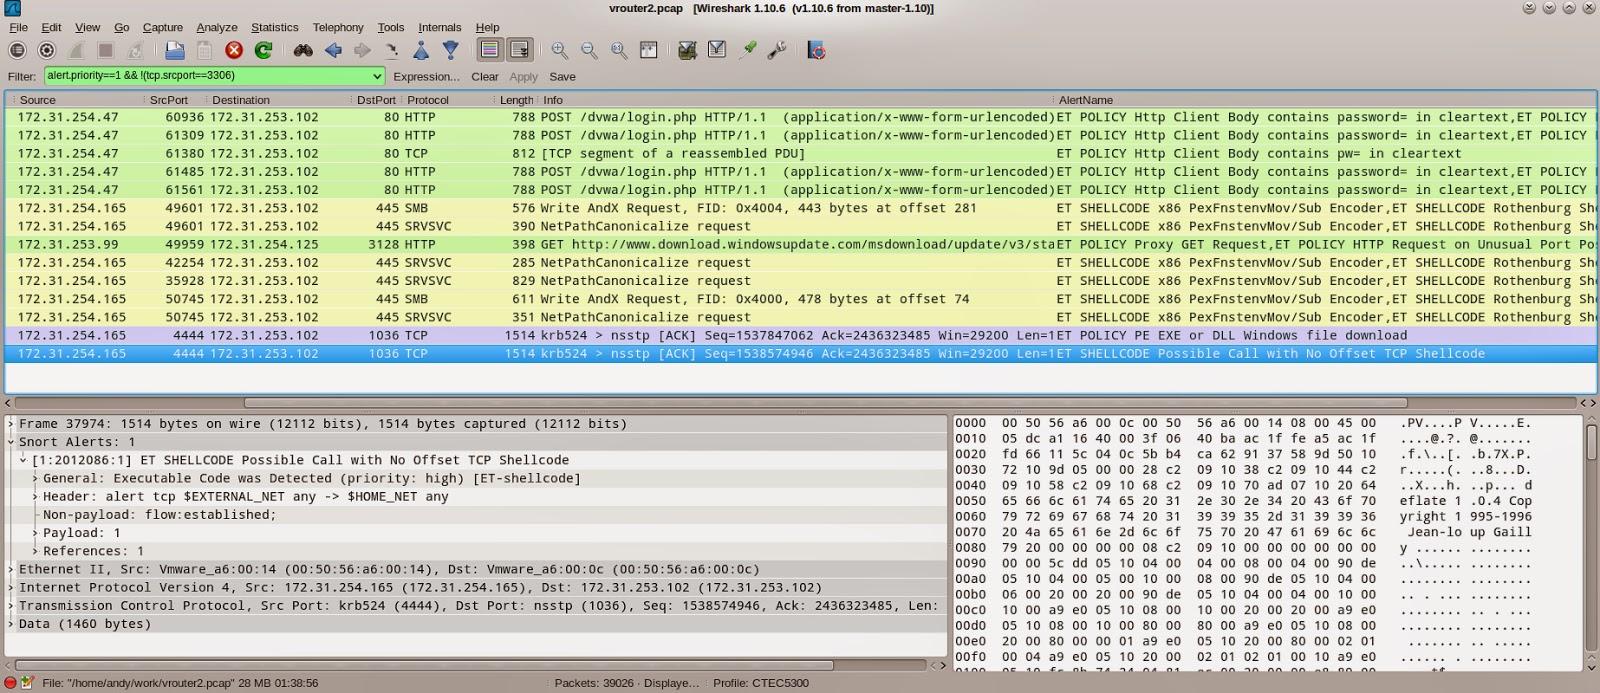 IDSUtil and Wireshark Alert plugin